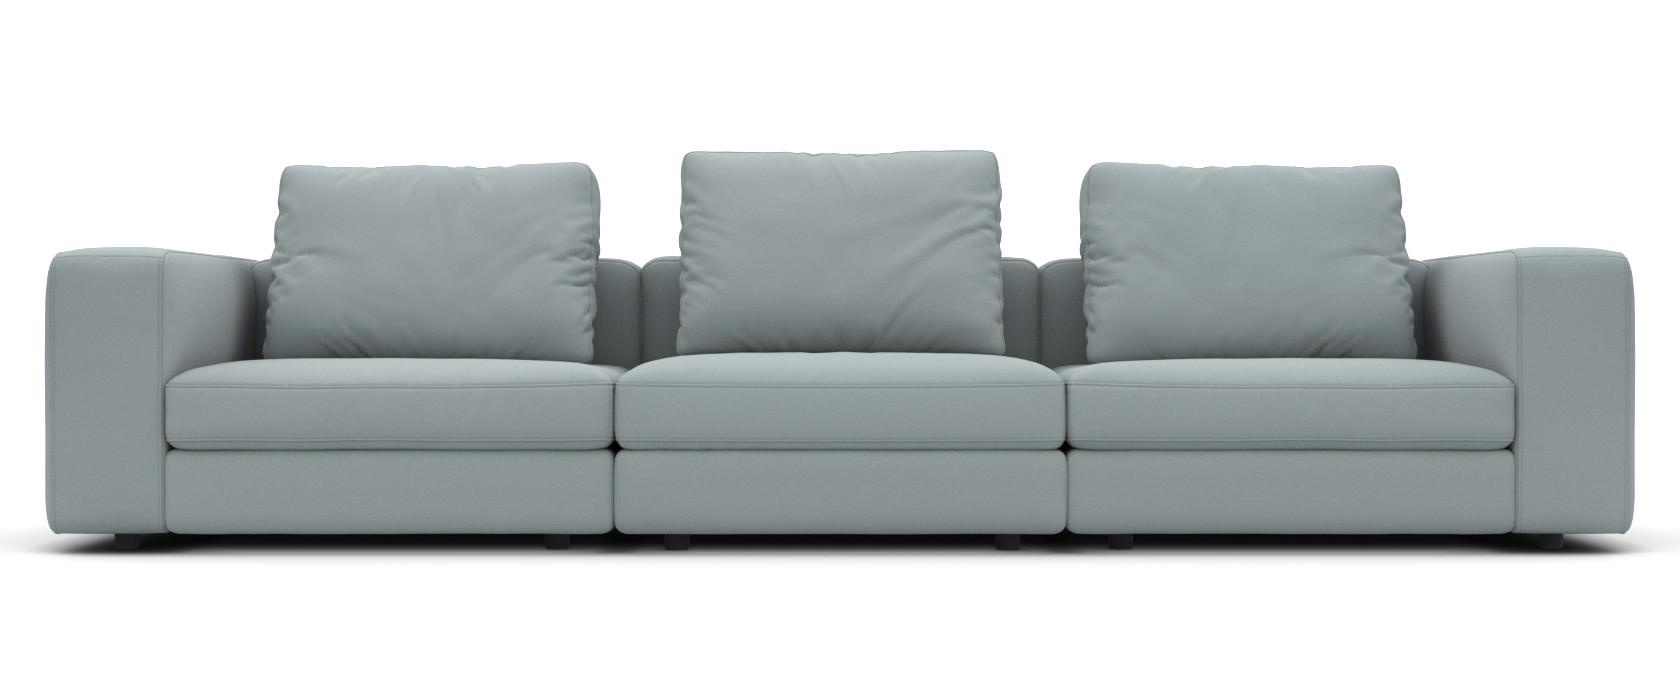 3-Sitzer Sofa Domino